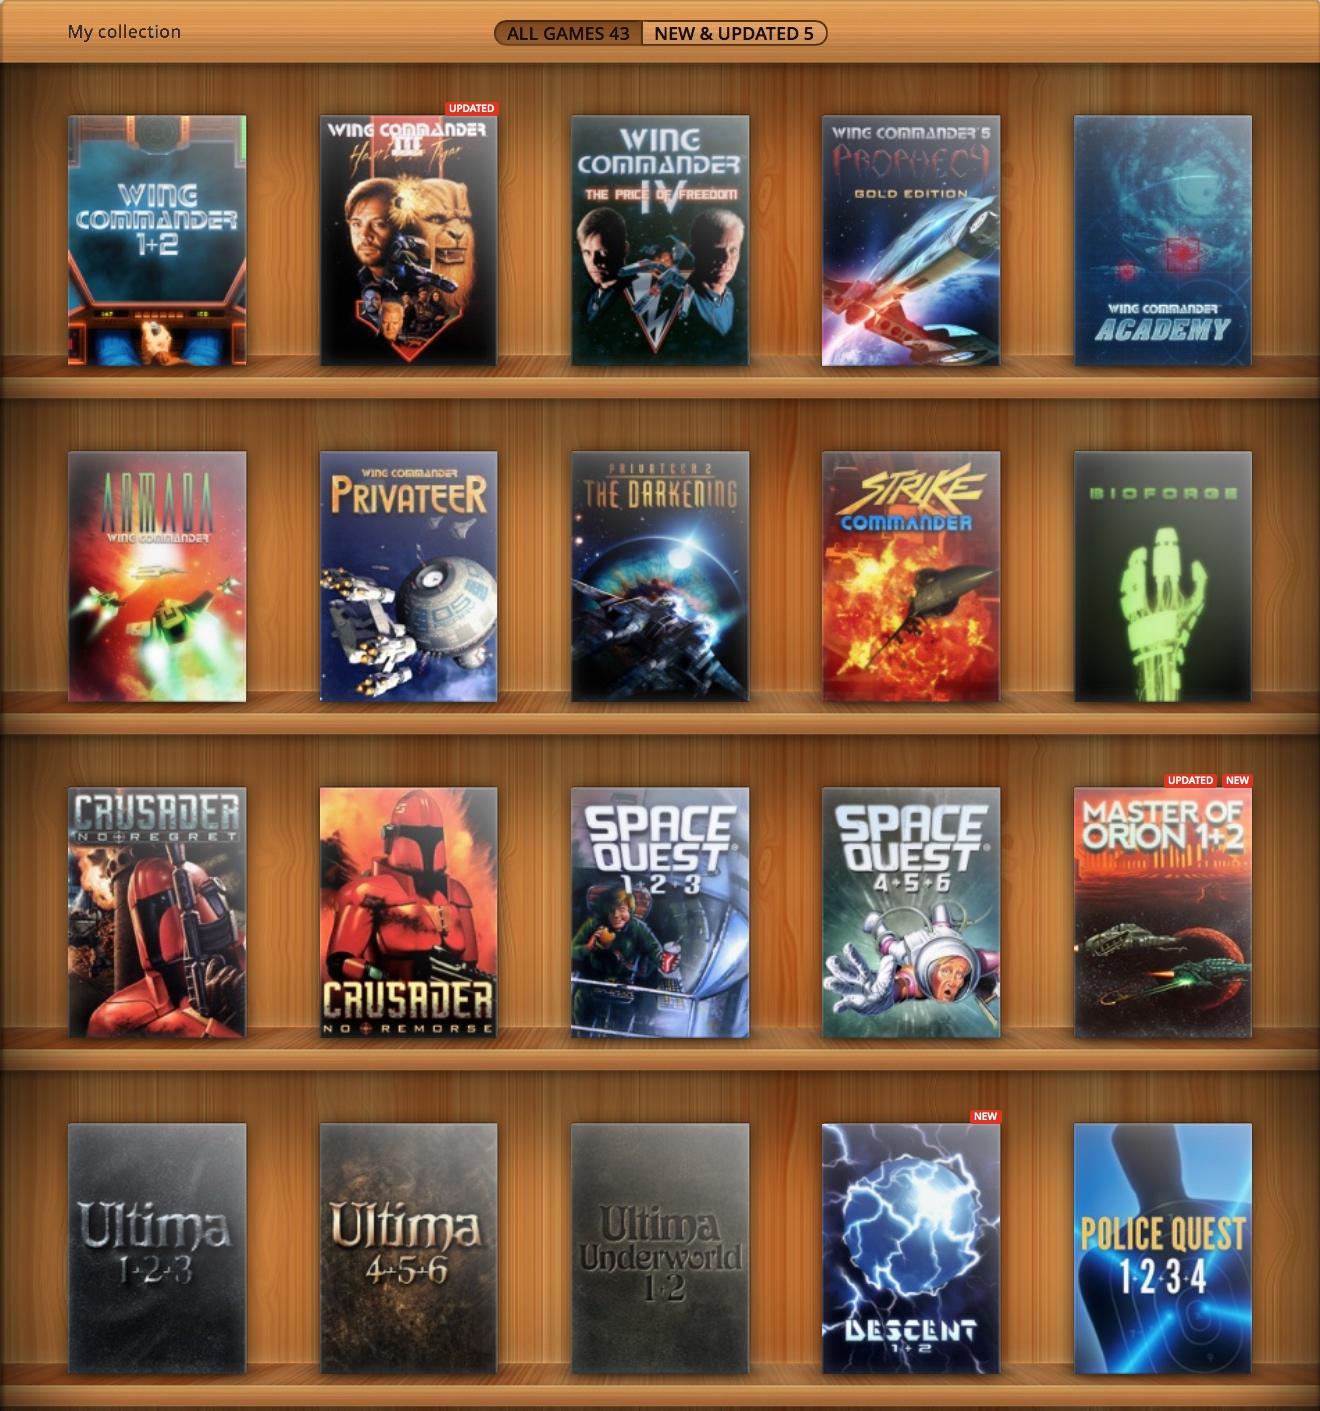 GOG Discounts EA Games by 60-85% - Wing Commander CIC